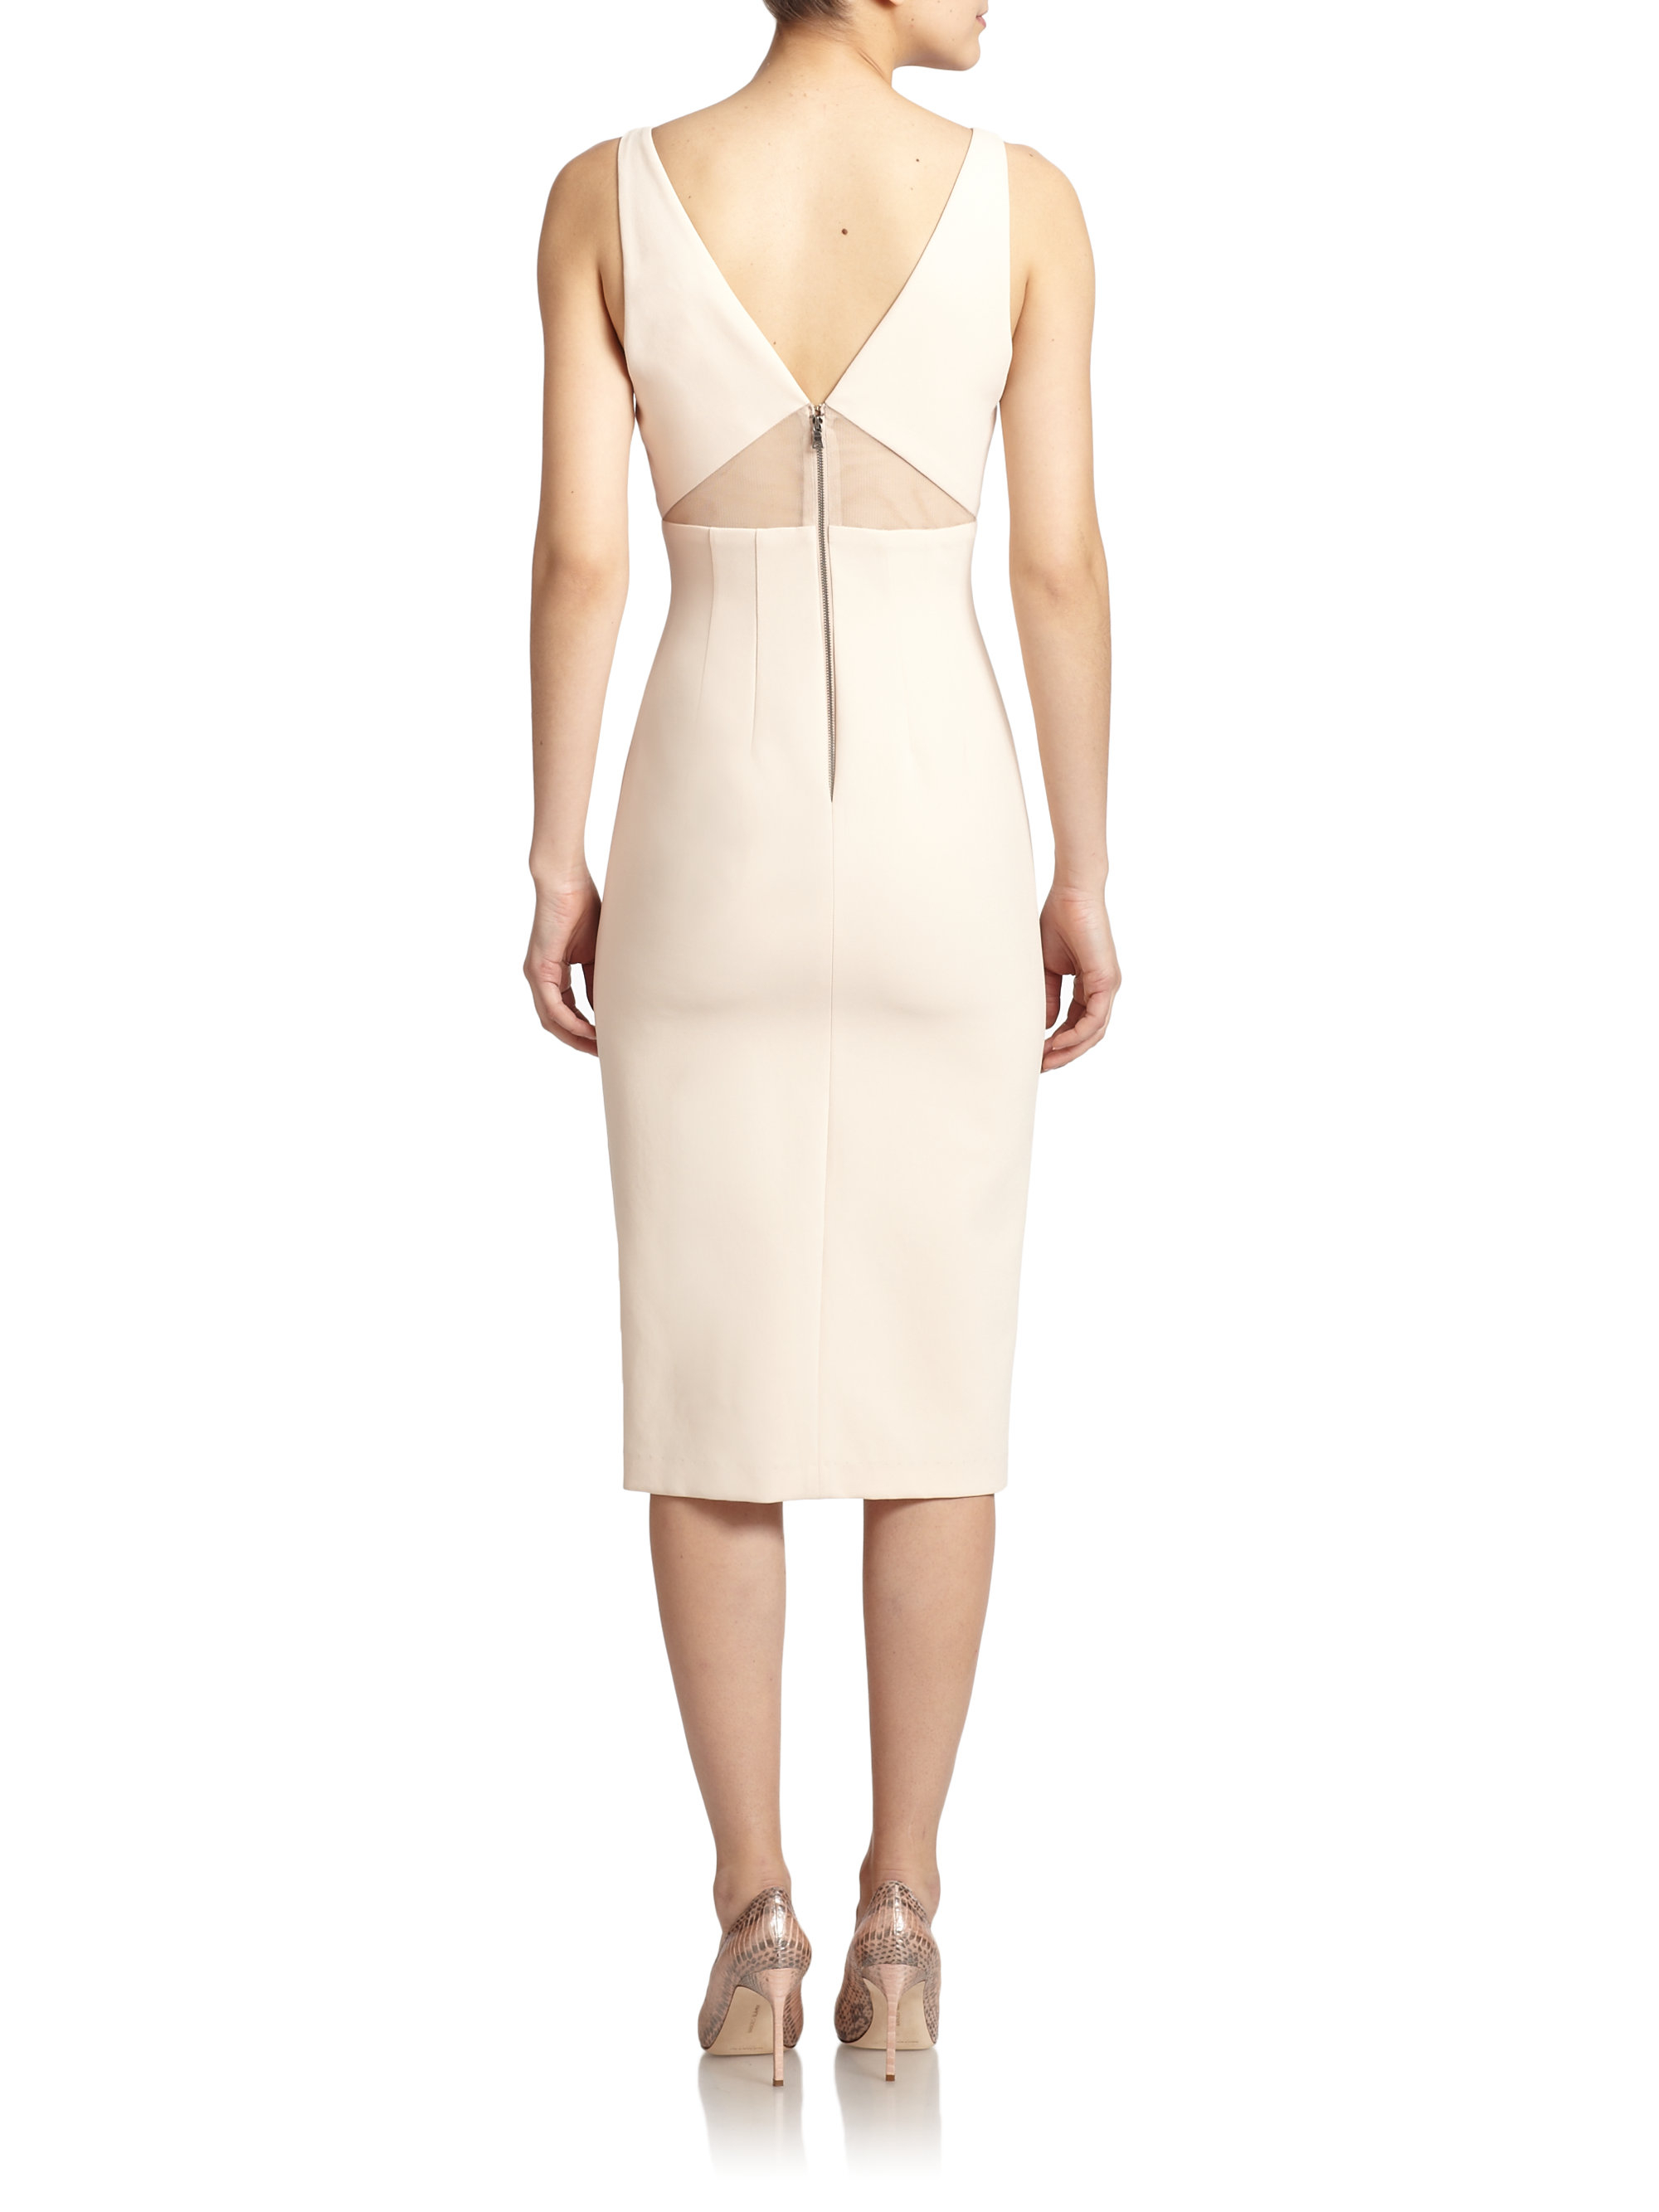 dash cutout front sheer paneled dress in